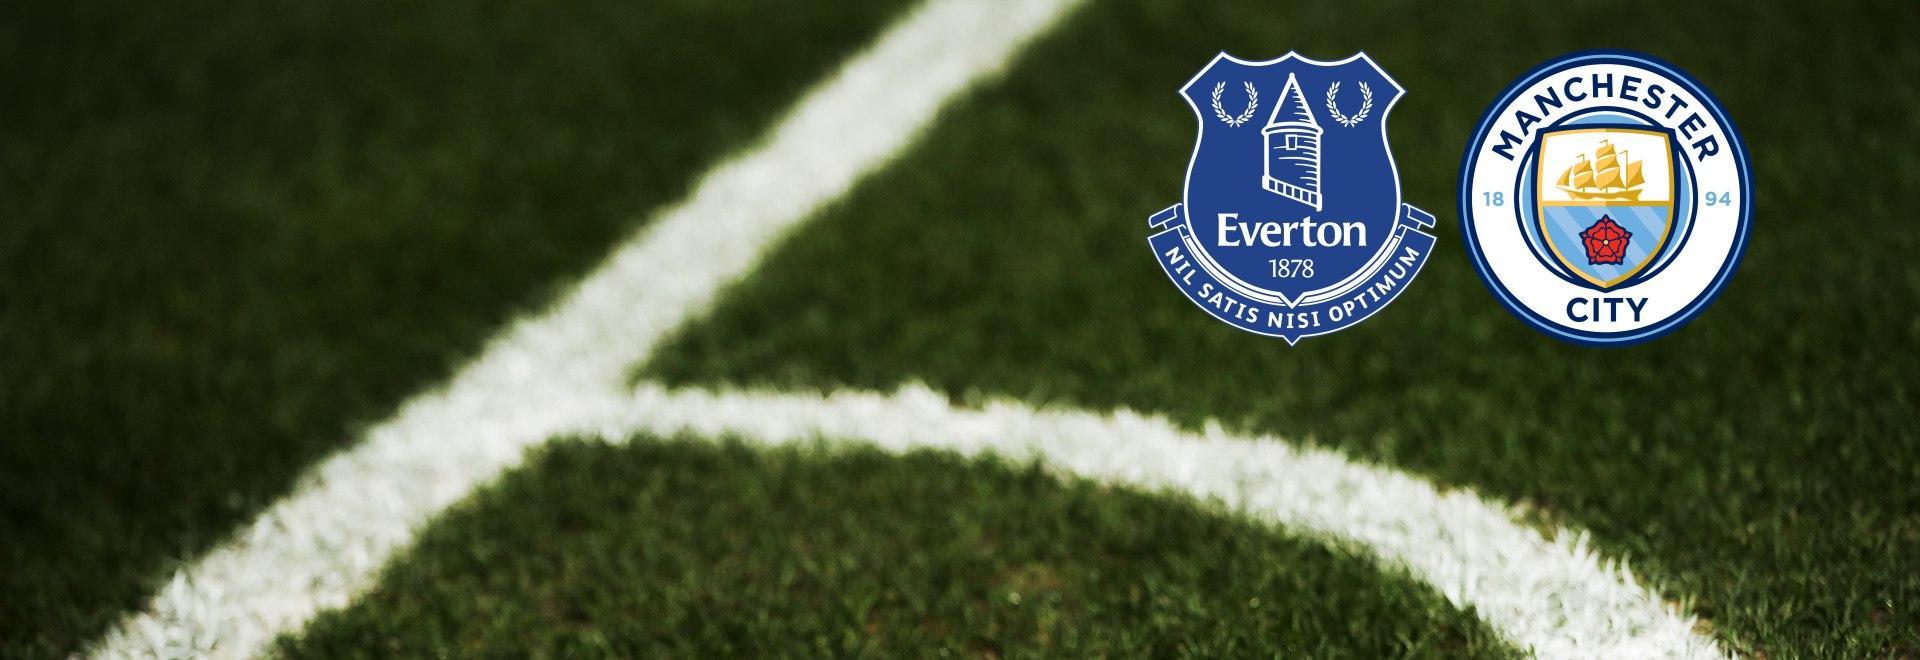 Everton - Manchester City. Quarti